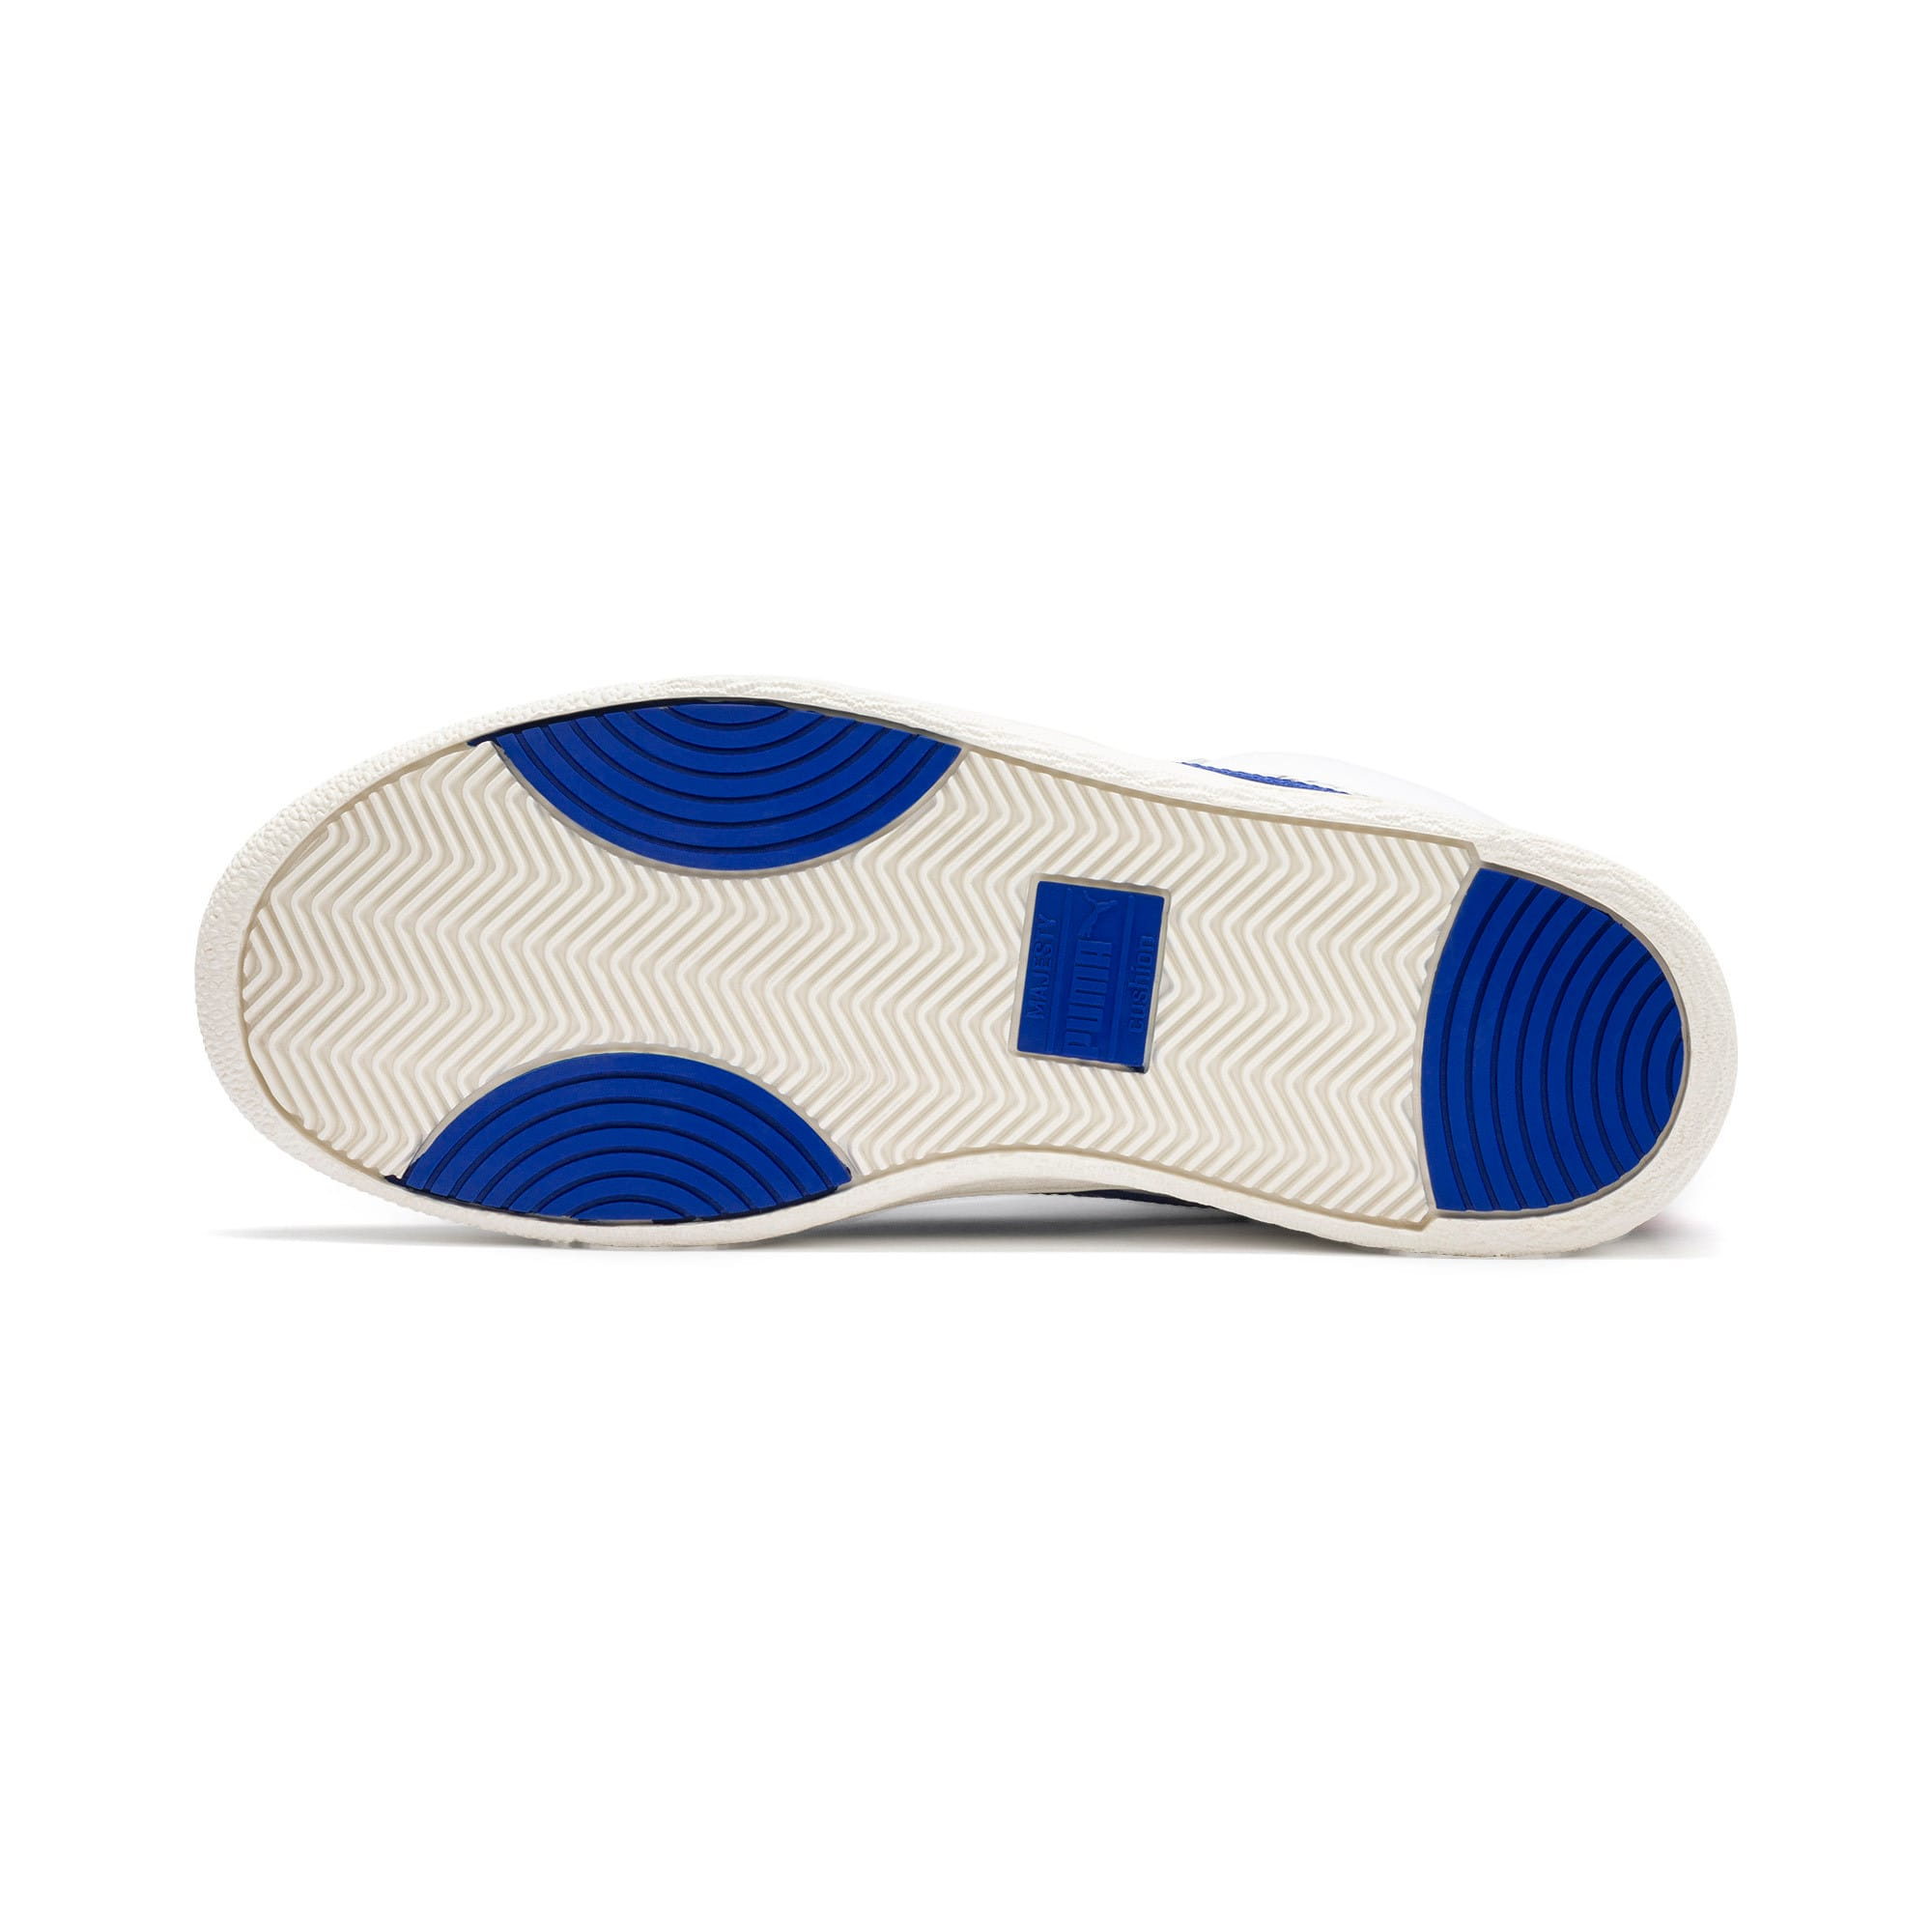 Thumbnail 4 of Ralph Sampson Mid Sneakers, Wht-Surf The Web-Marshmallow, medium